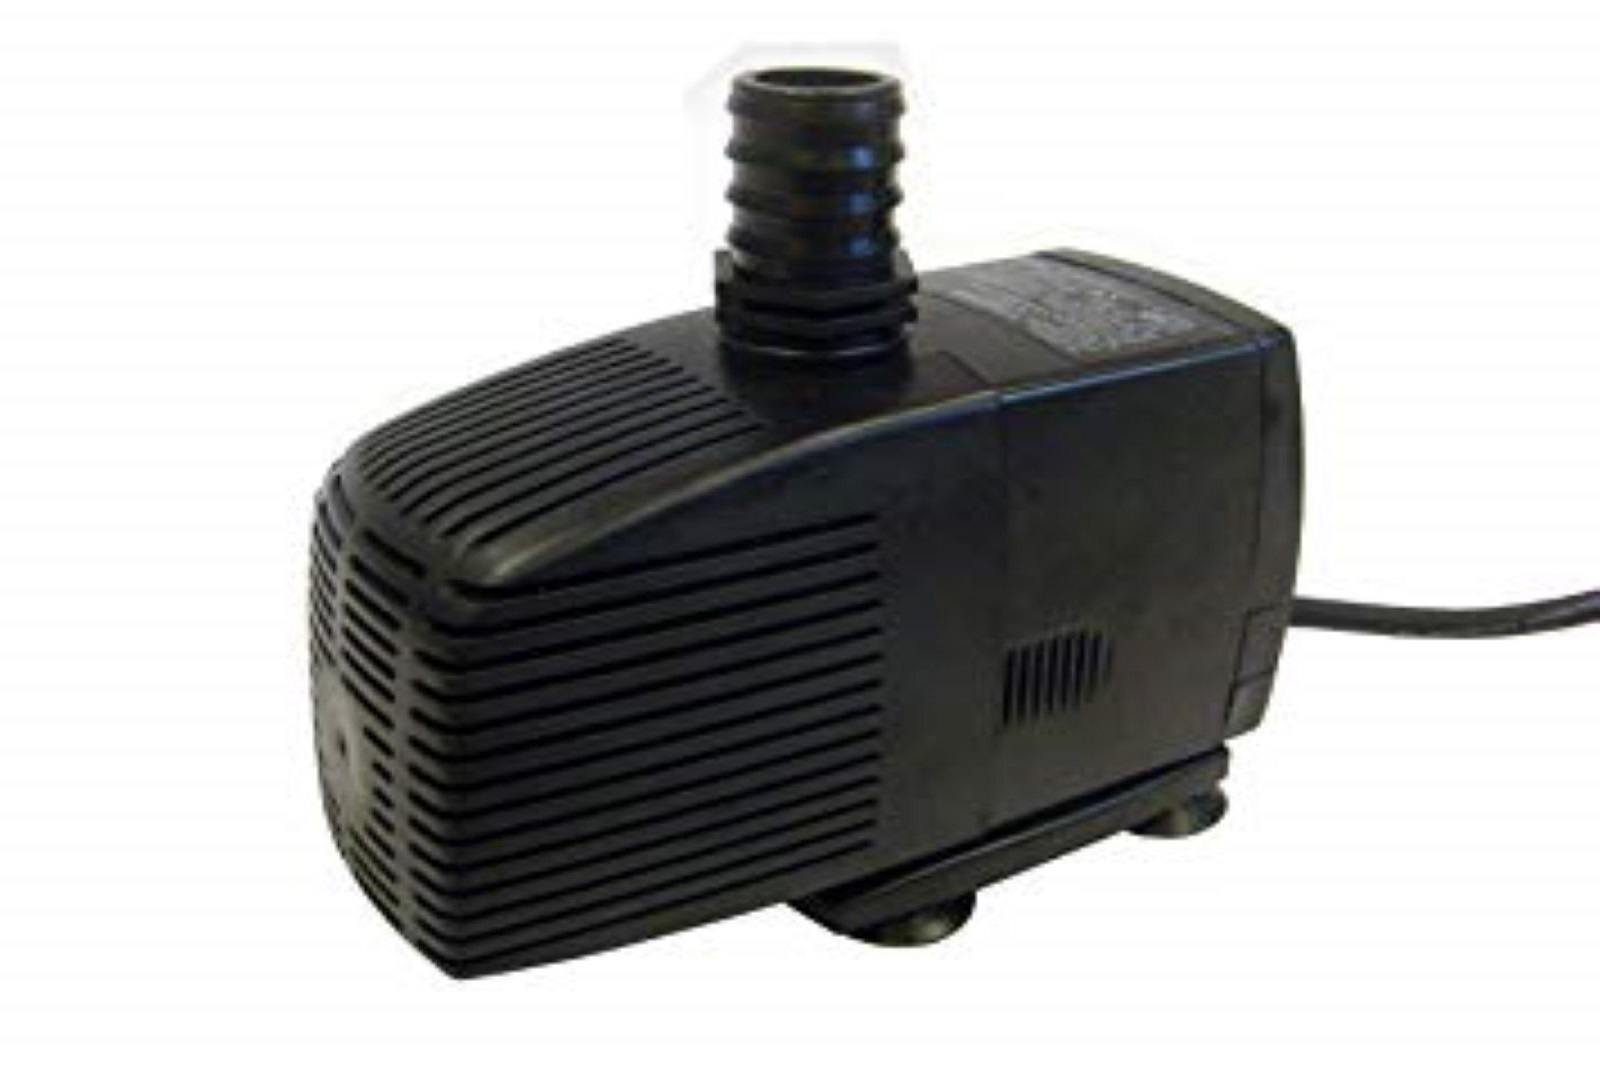 Kerry Electronics Teichpumpe KEP3000N, 3000l/h, 230V